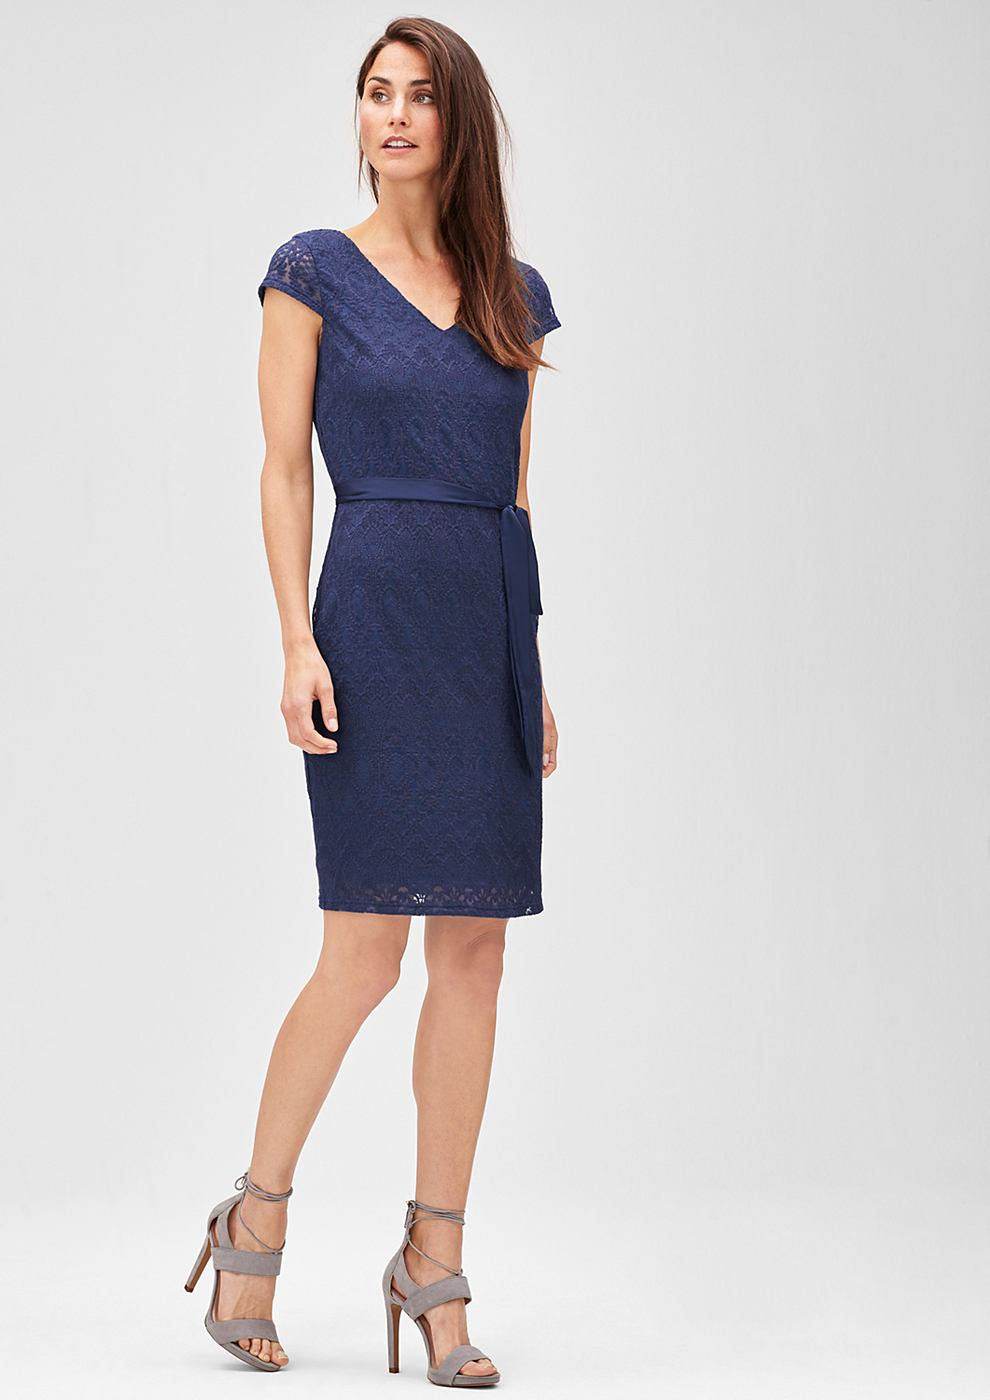 s.Oliver Premium kanten jurk met strikceintuur blauw